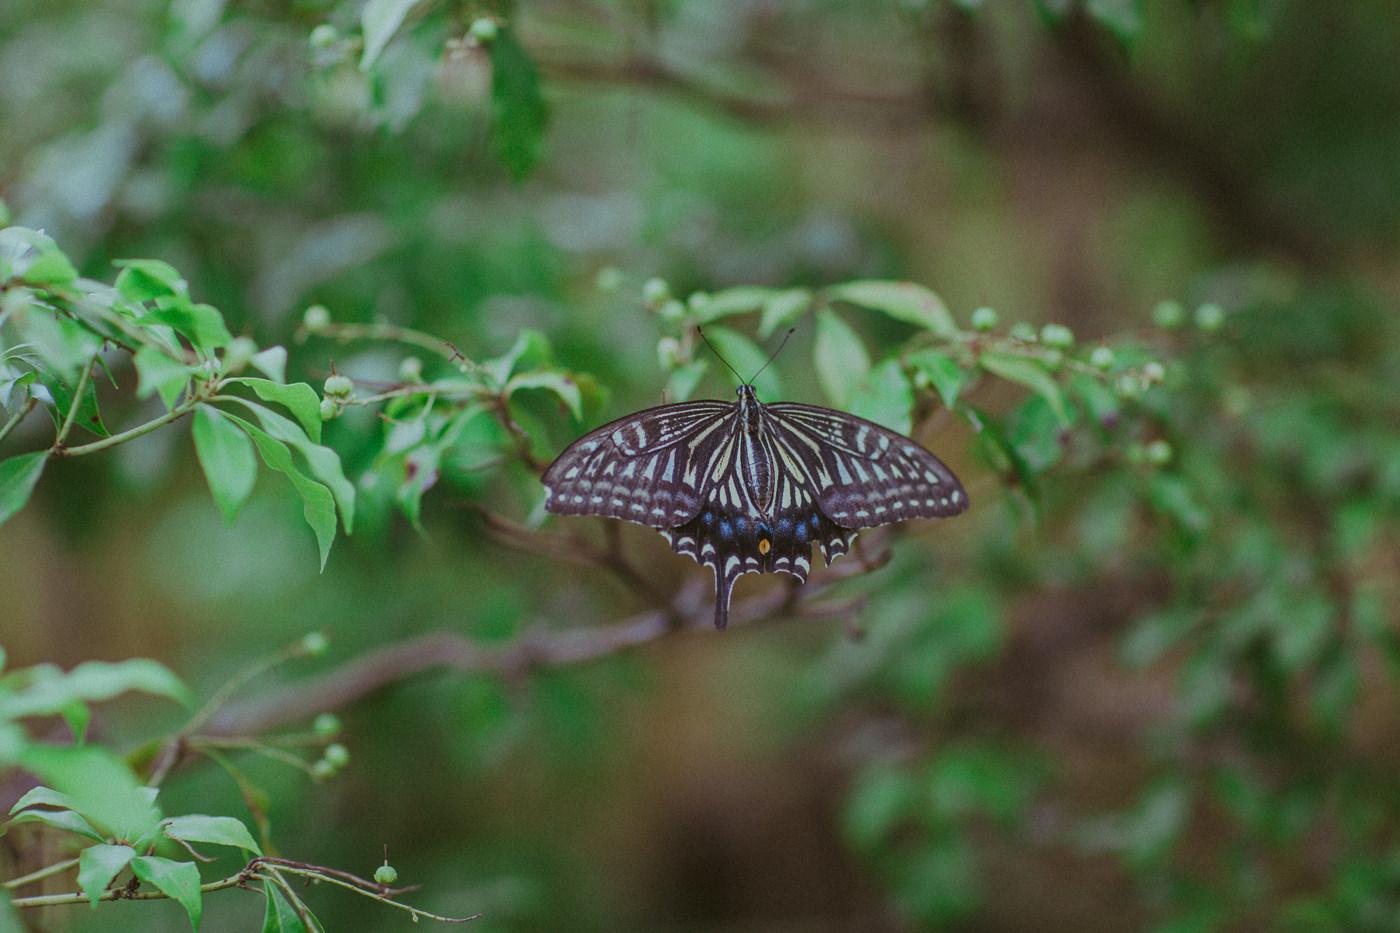 serenity - butterfly in garden